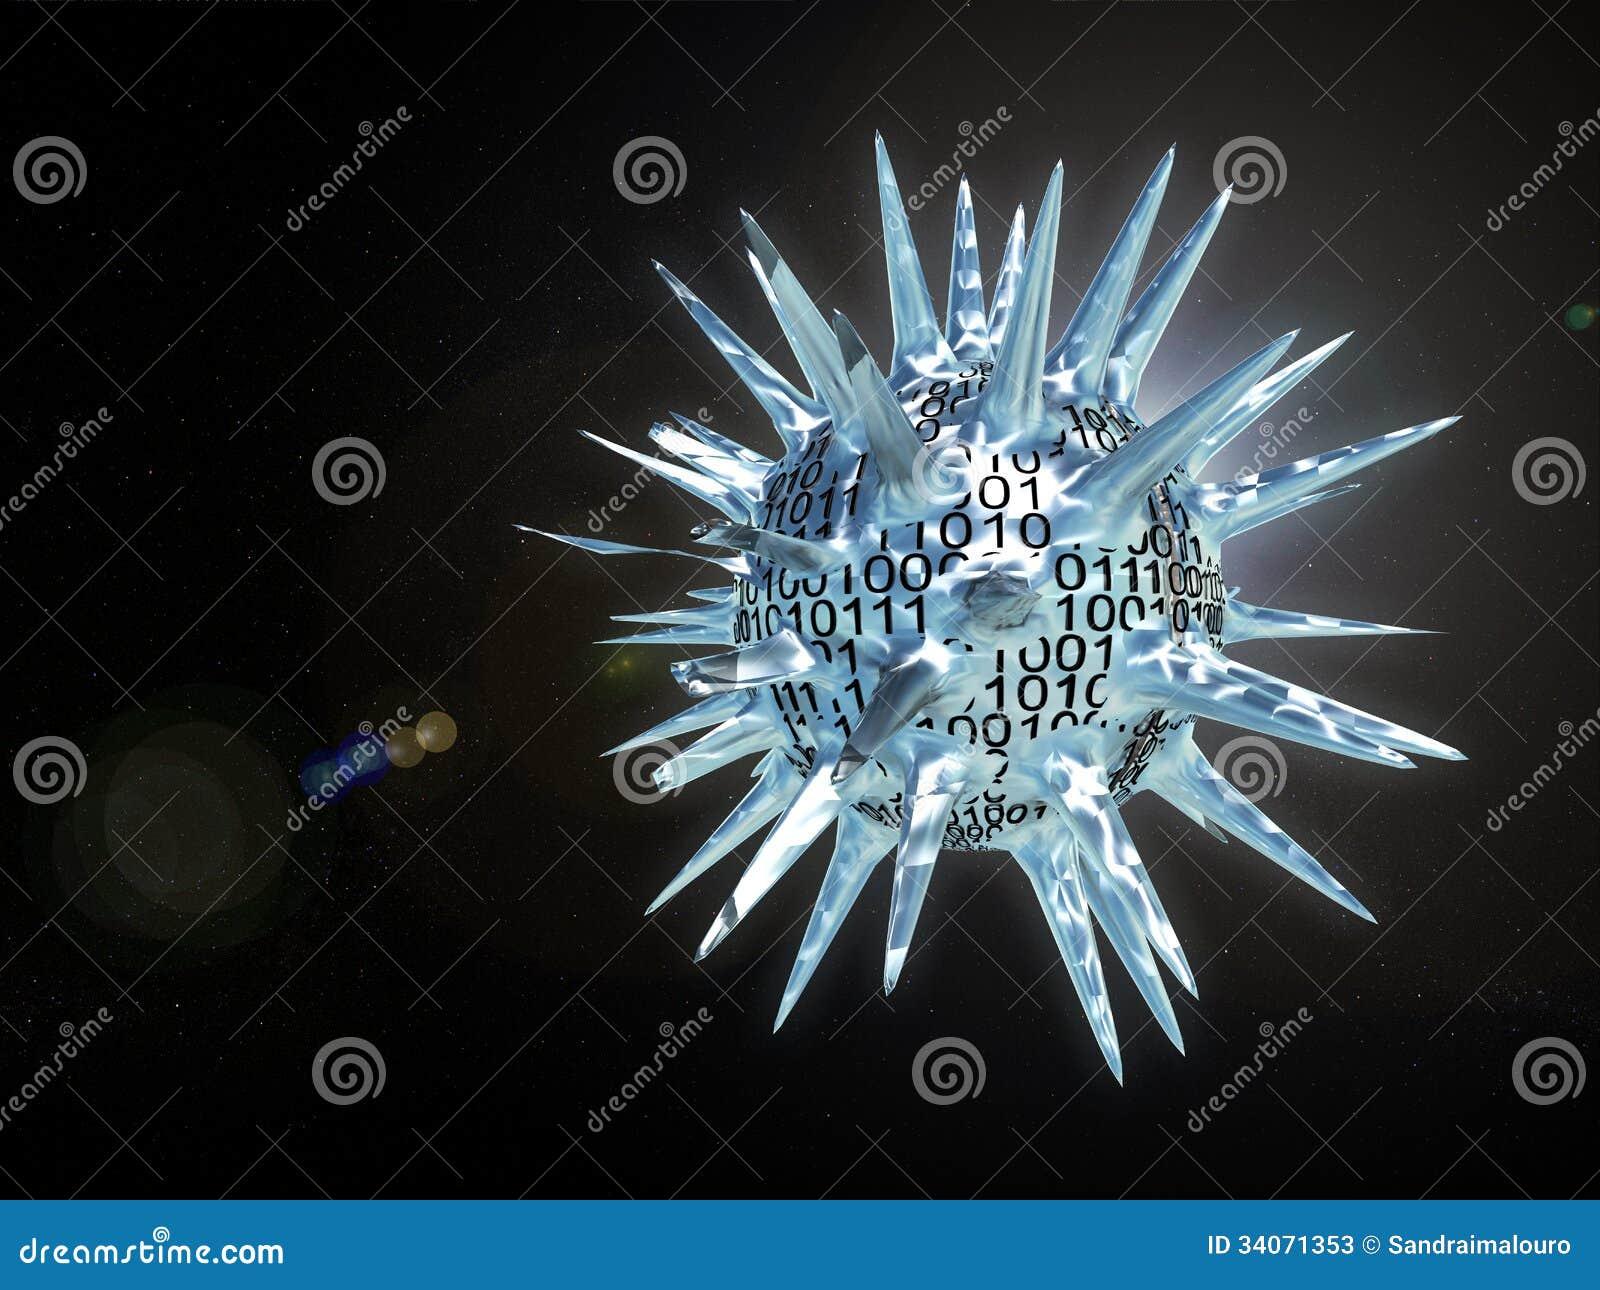 spacecraft virus - photo #35